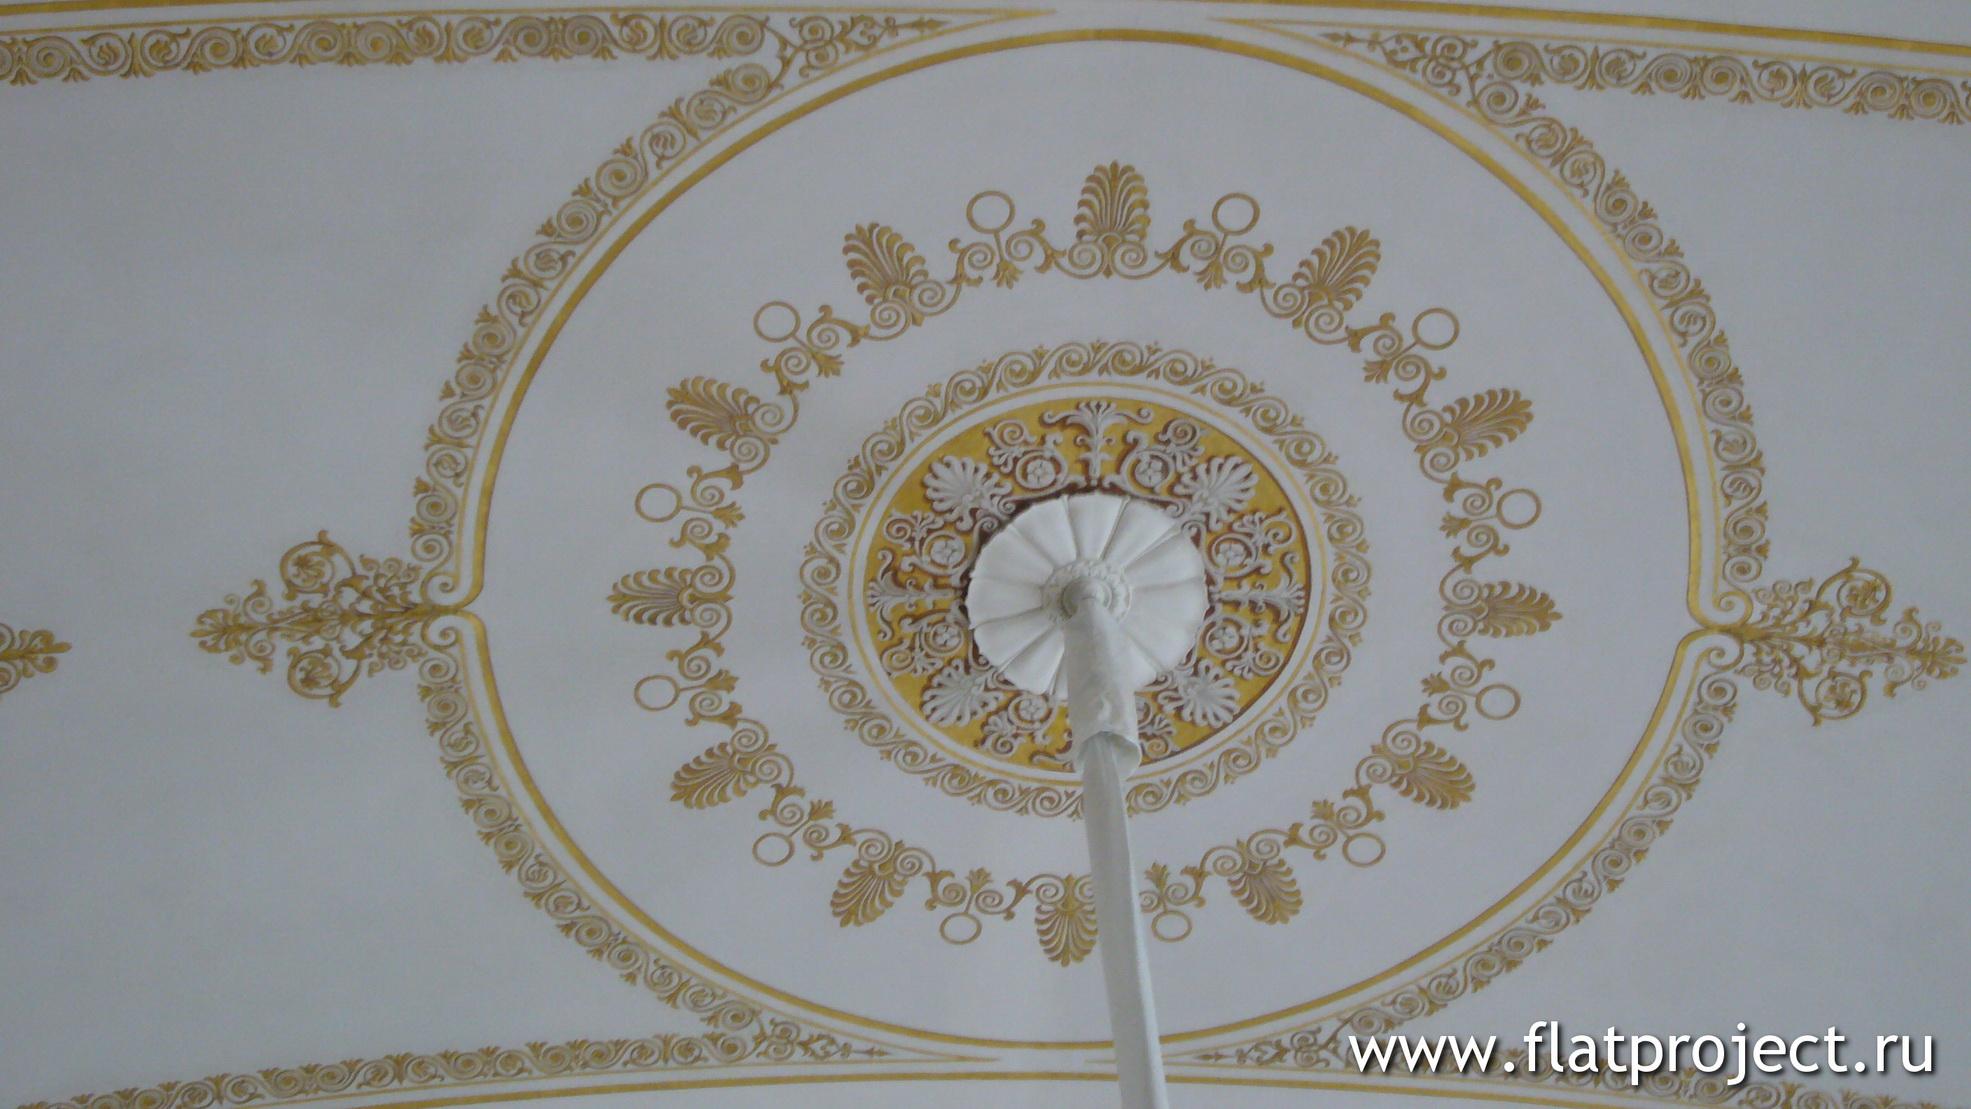 The State Hermitage museum interiors – photo 295